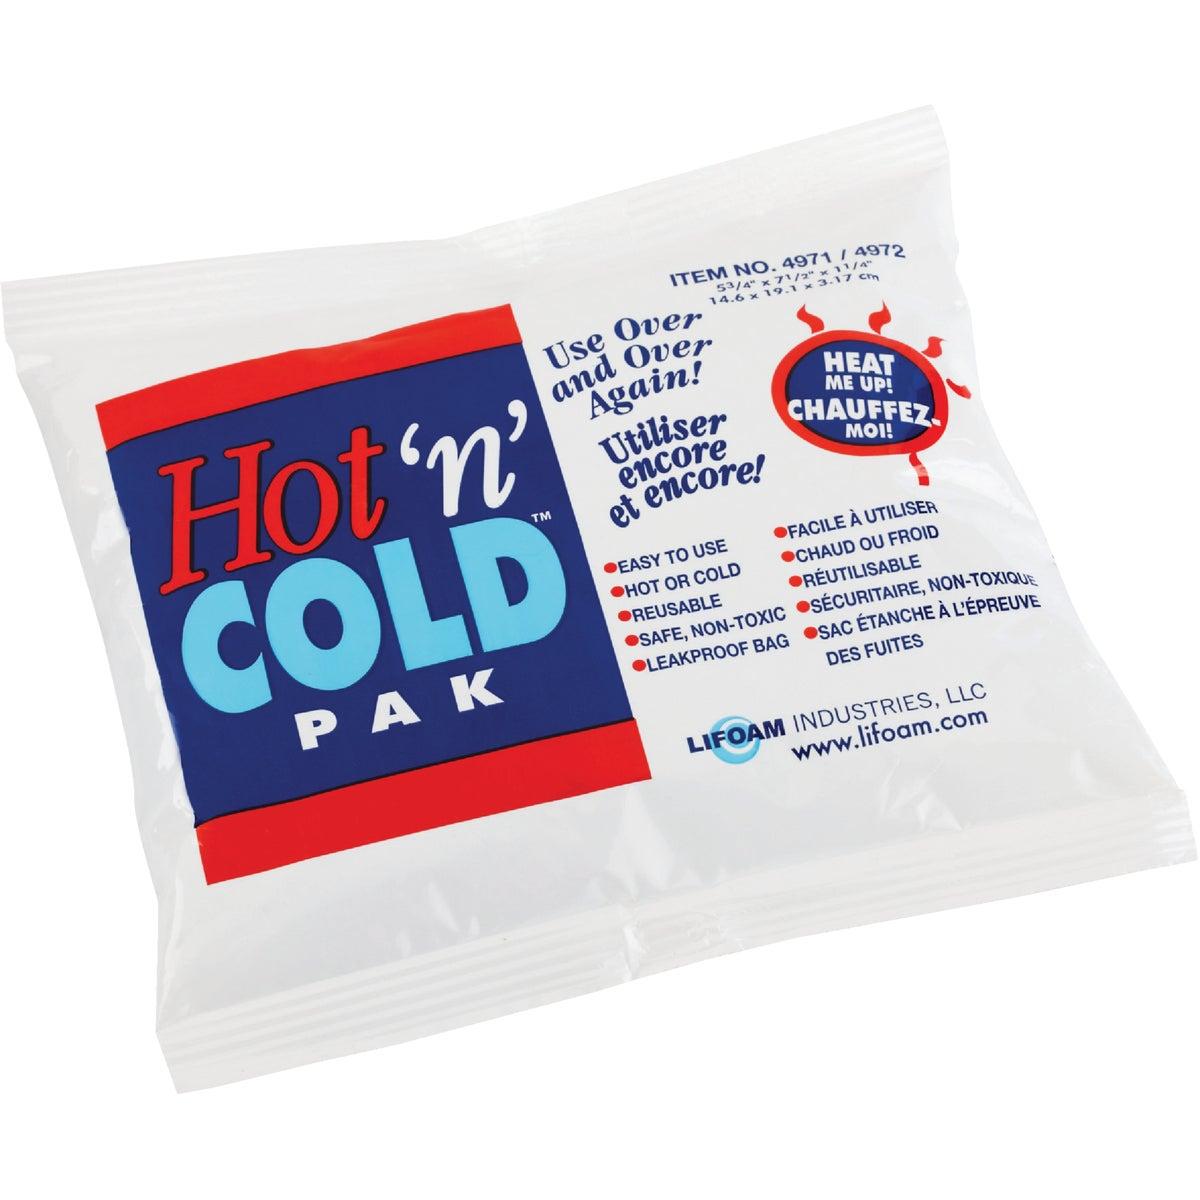 Lifoam Div. Life Like REUSABLE HOT N COLD PACK 4971